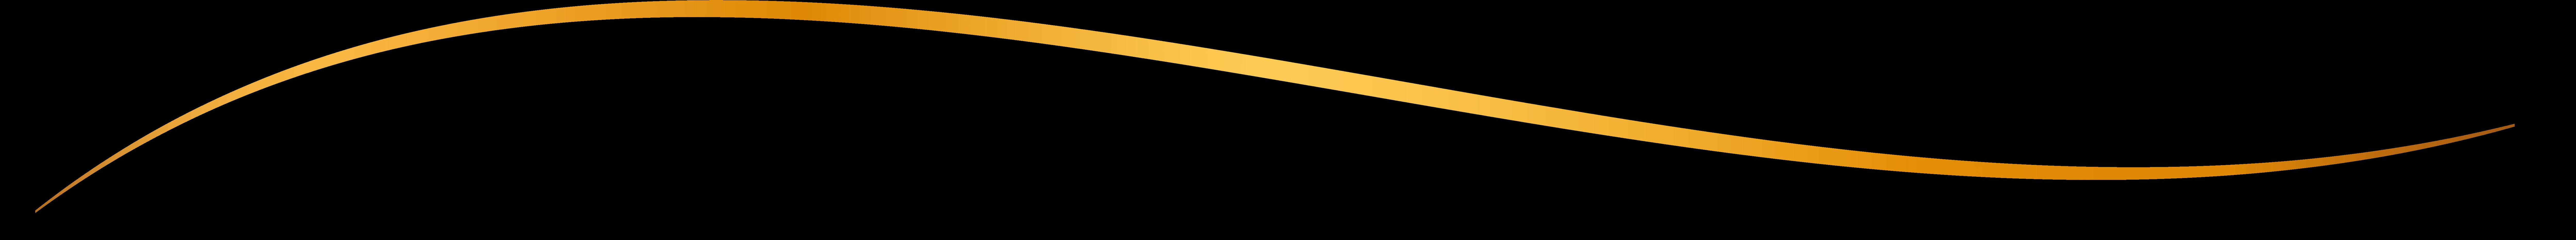 goldcurve